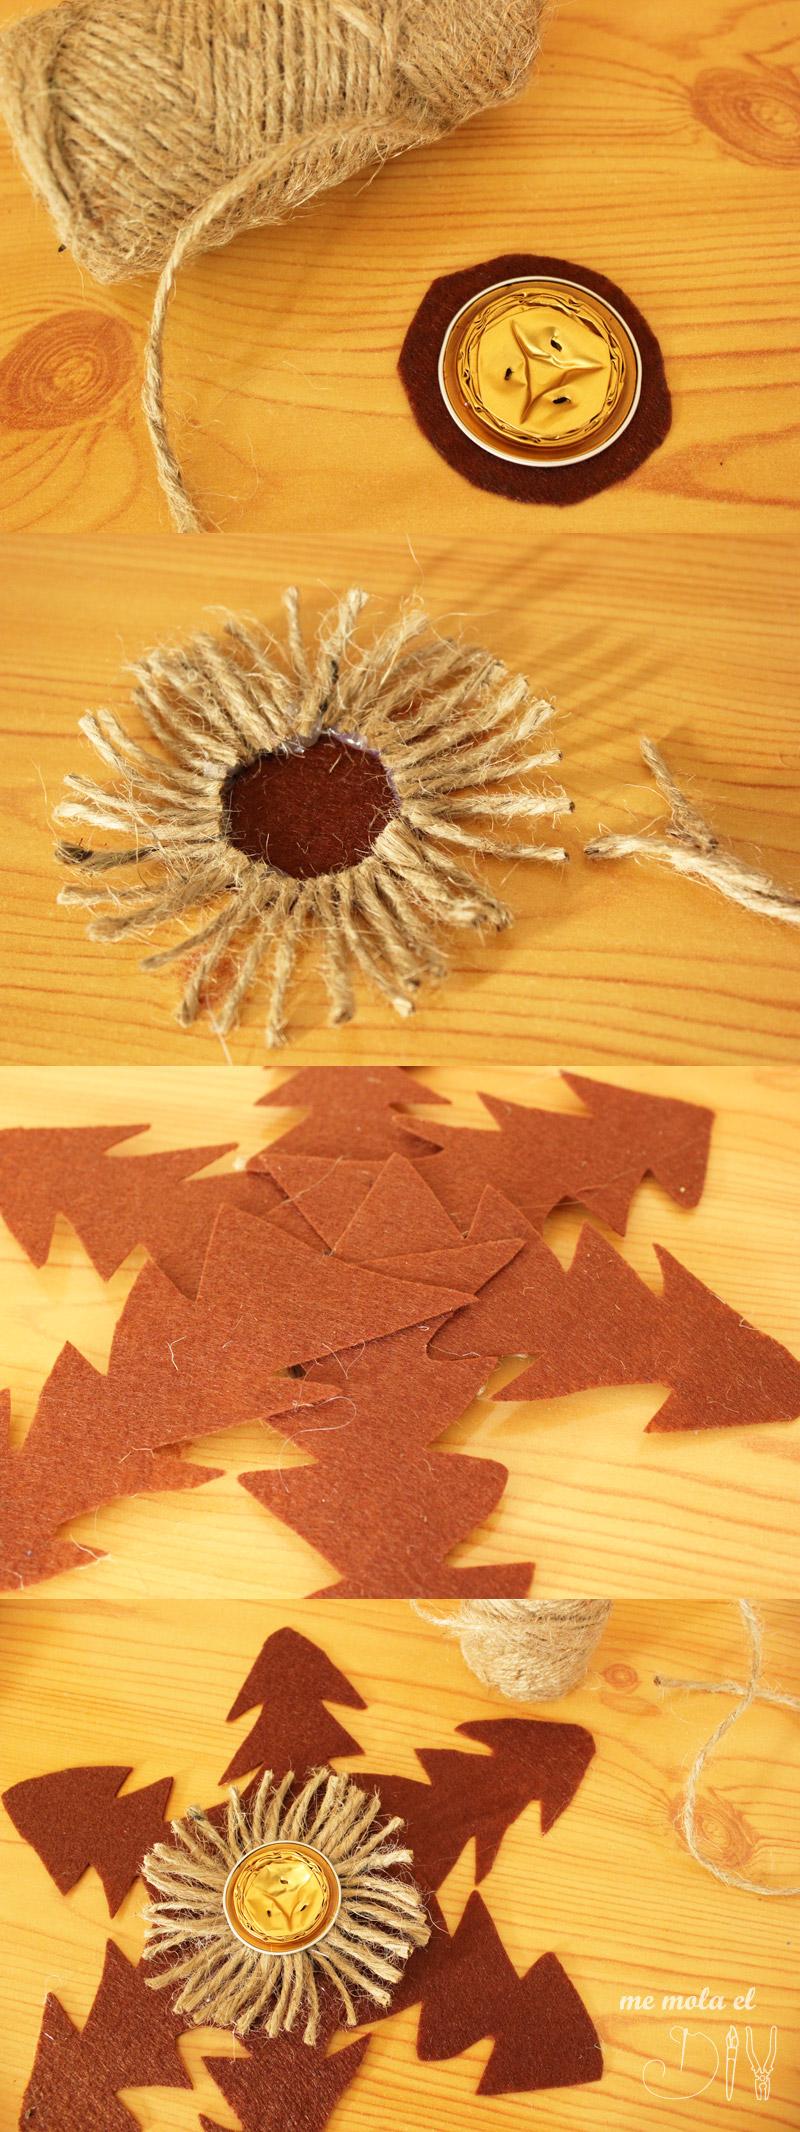 tutorial eguzkilorea halloween pais vasco